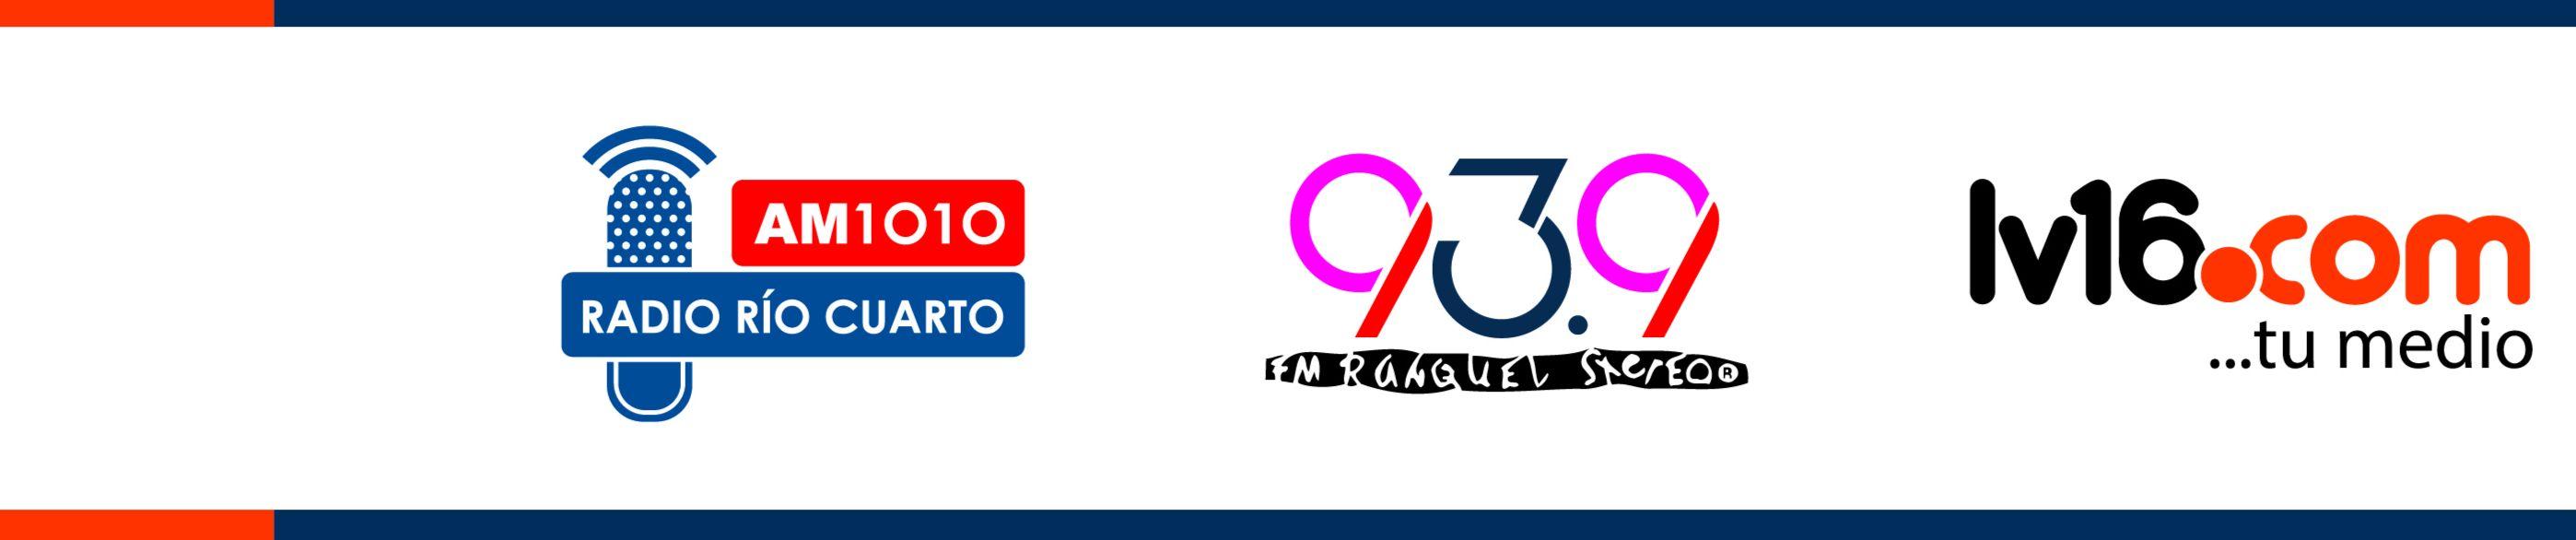 Novena San Grato (Bengolea) by LV16 | Radio Río Cuarto LV16 | Free ...